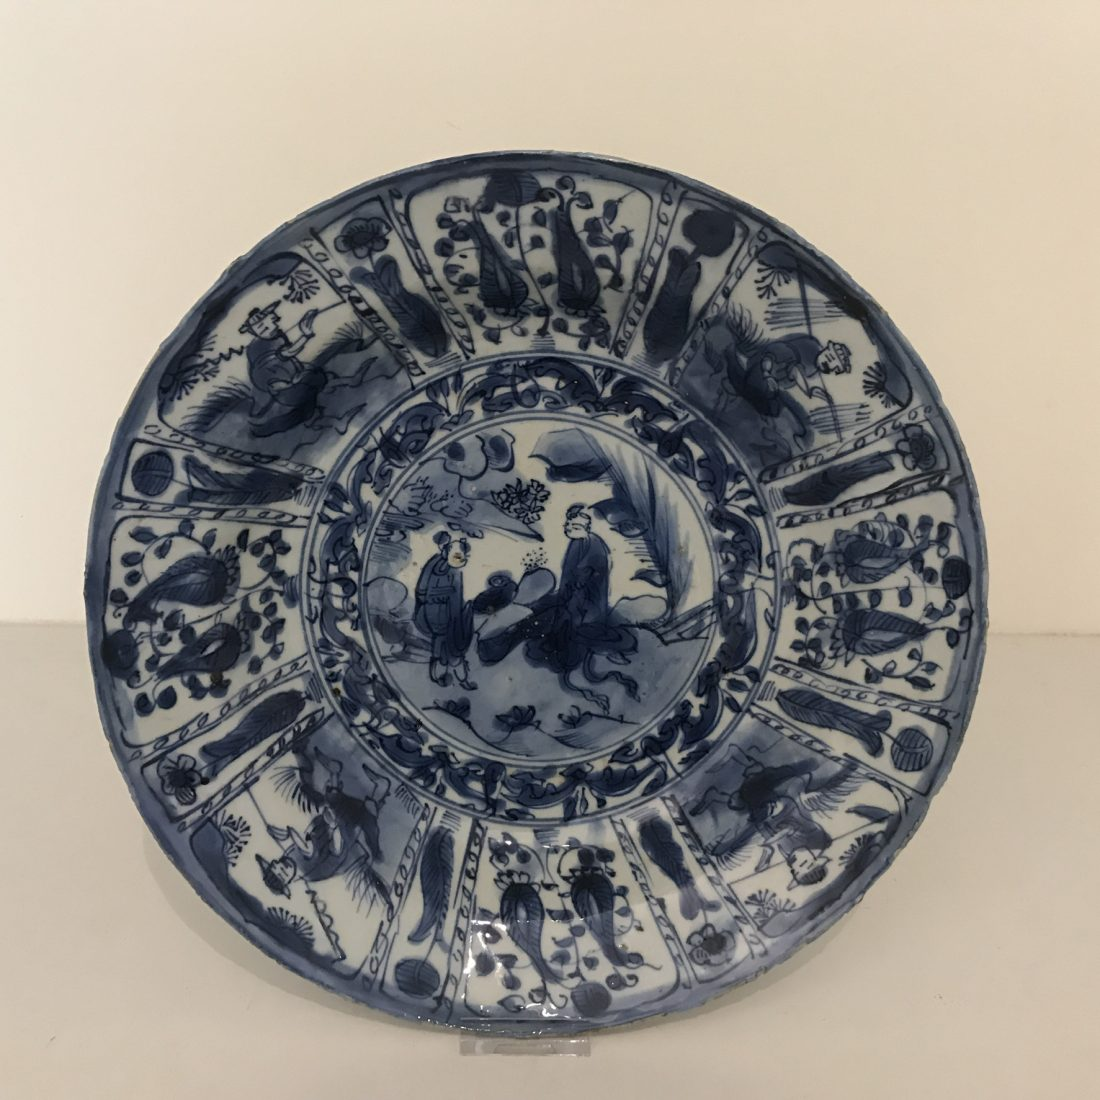 Blauw/wit porseleinen schotel, China, Wanli periode (1572 – 1620)